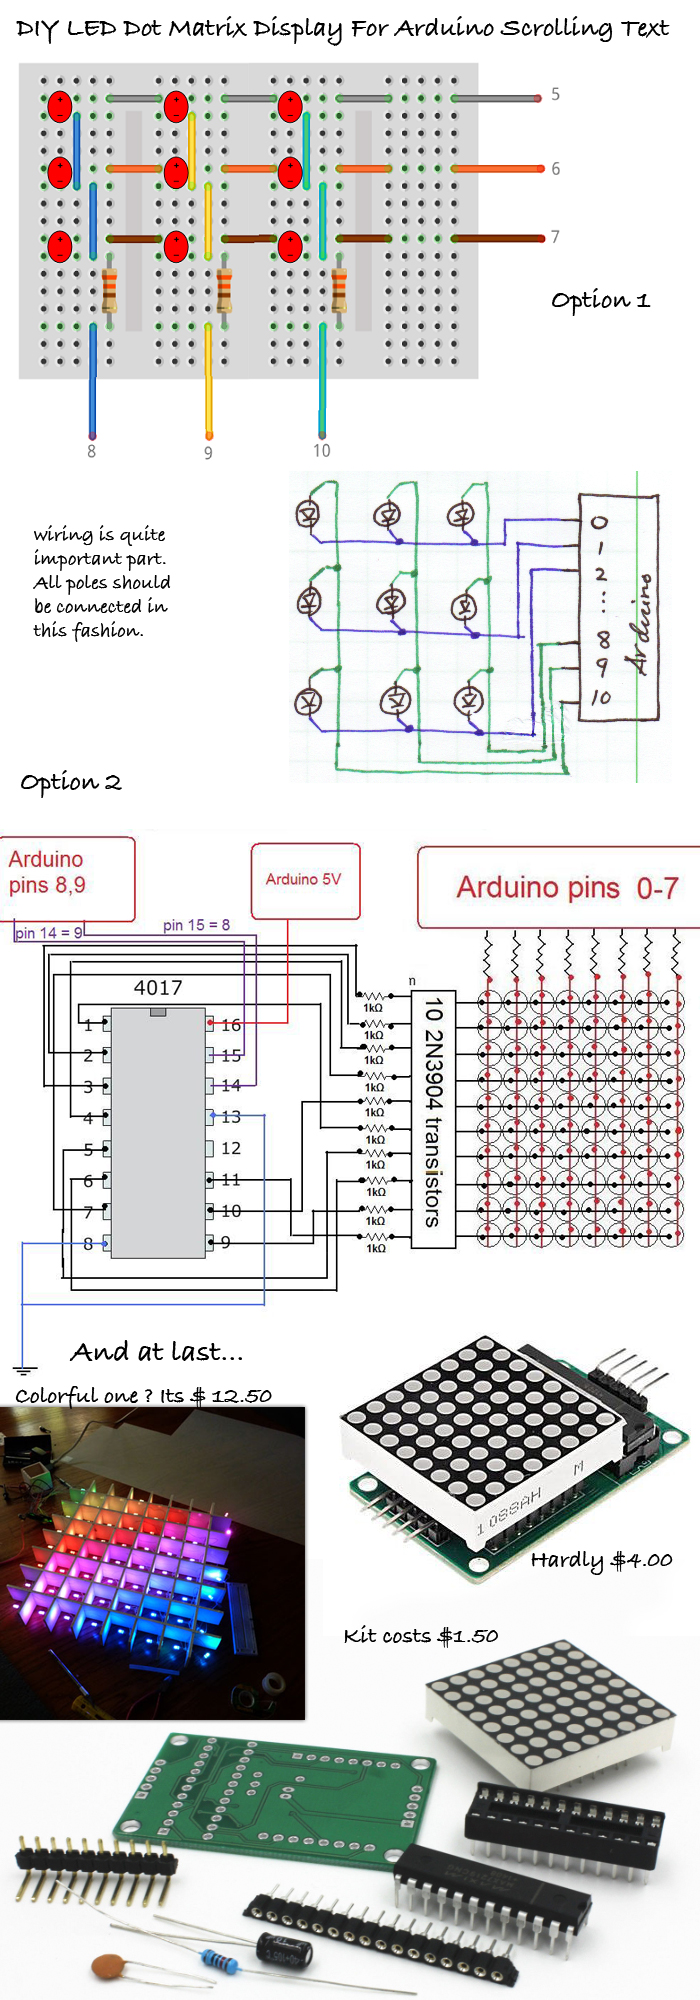 DIY-LED-Dot-Matrix-Display-For-Arduino-Scrolling-Text